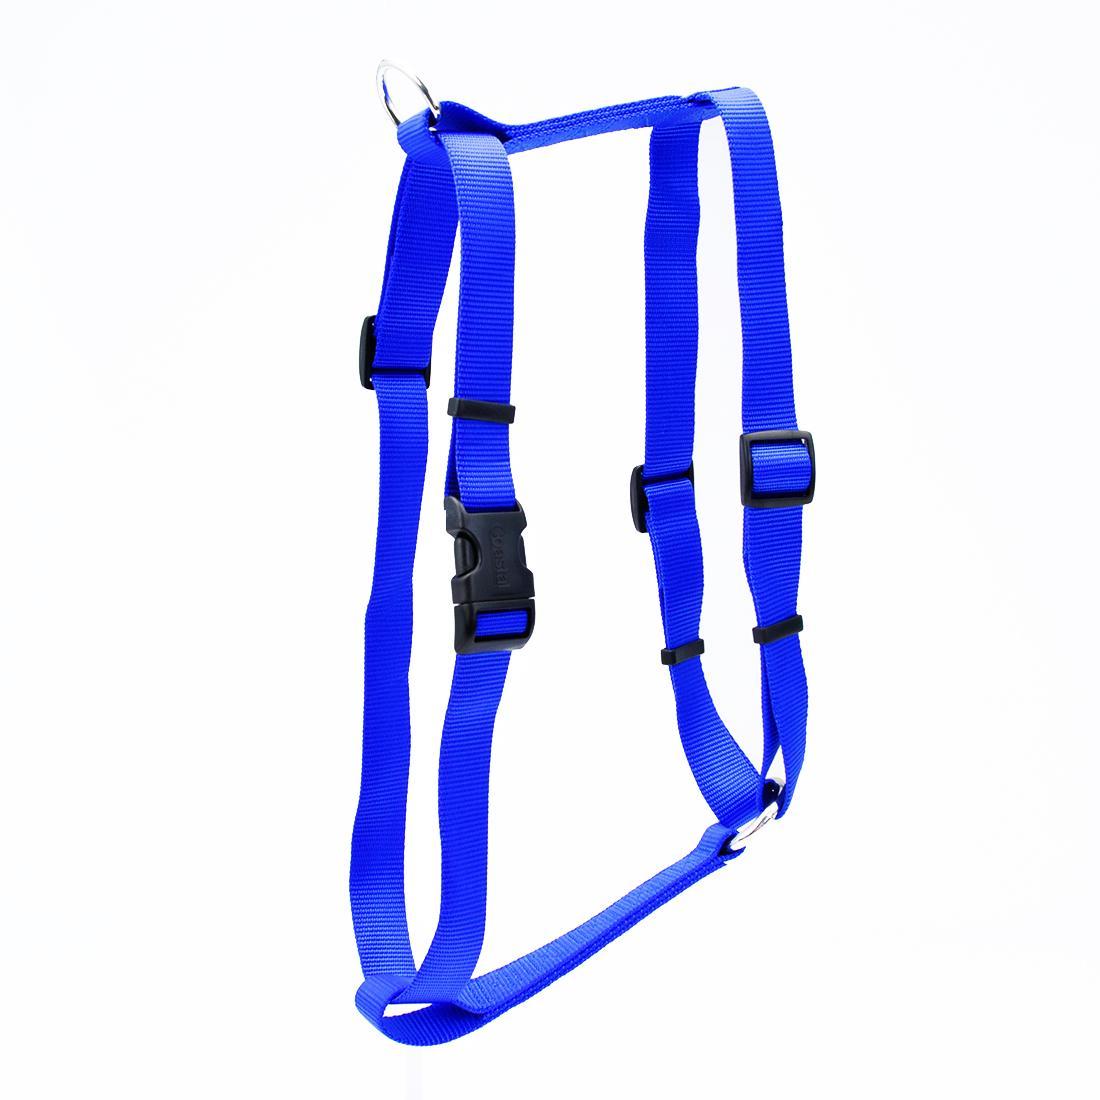 Coastal Standard Adjustable Dog Harness, Blue, 3/4-in x 18-30-in